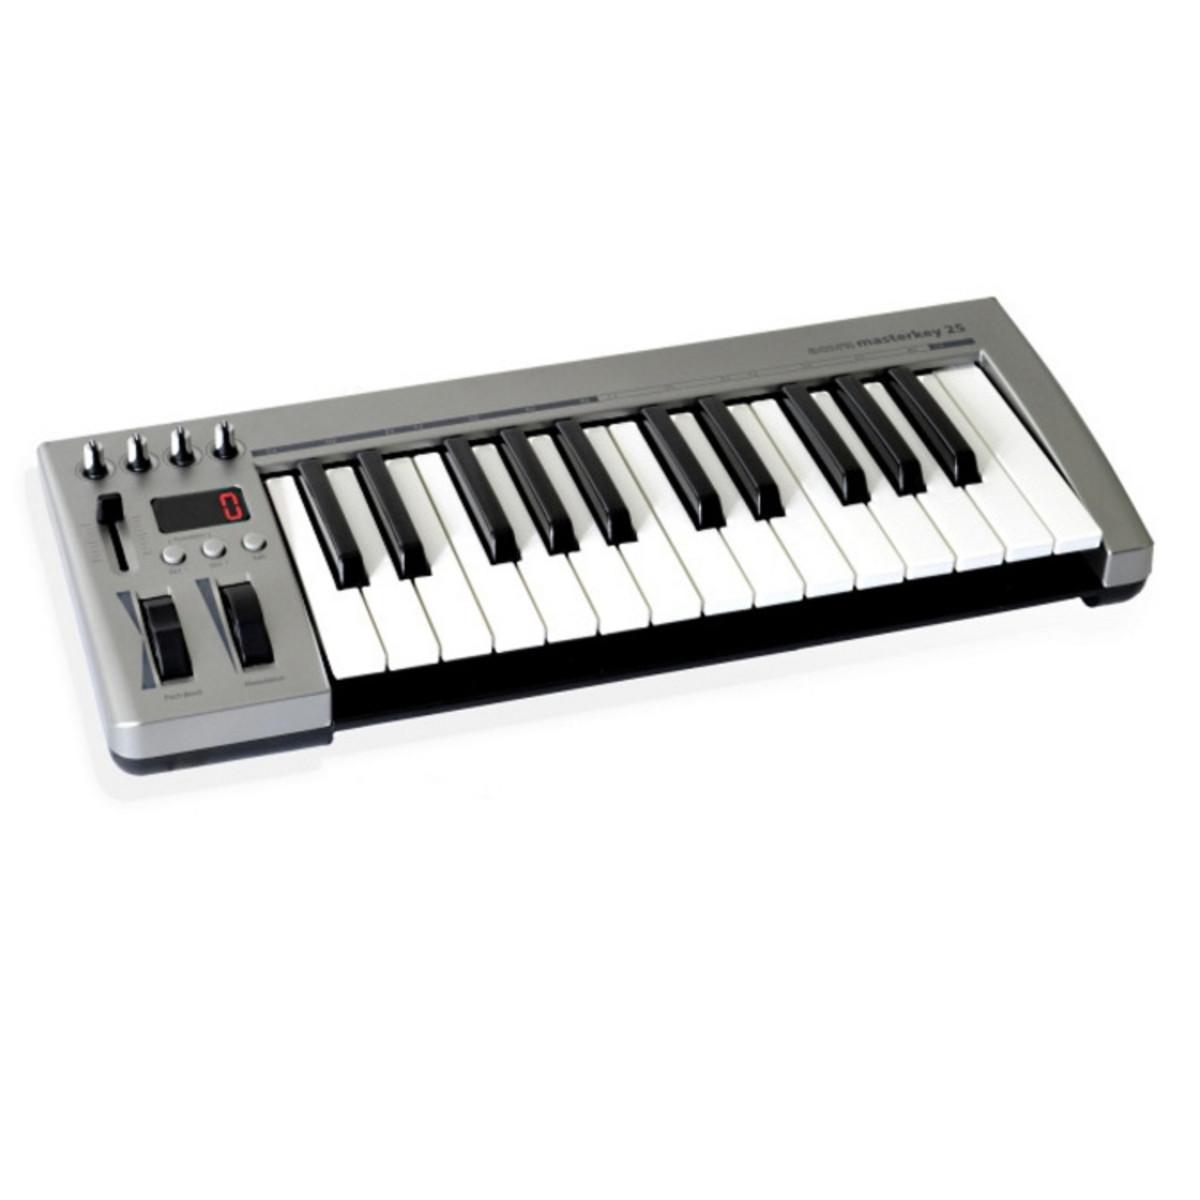 acorn instruments masterkey 25 key usb midi keyboard at. Black Bedroom Furniture Sets. Home Design Ideas